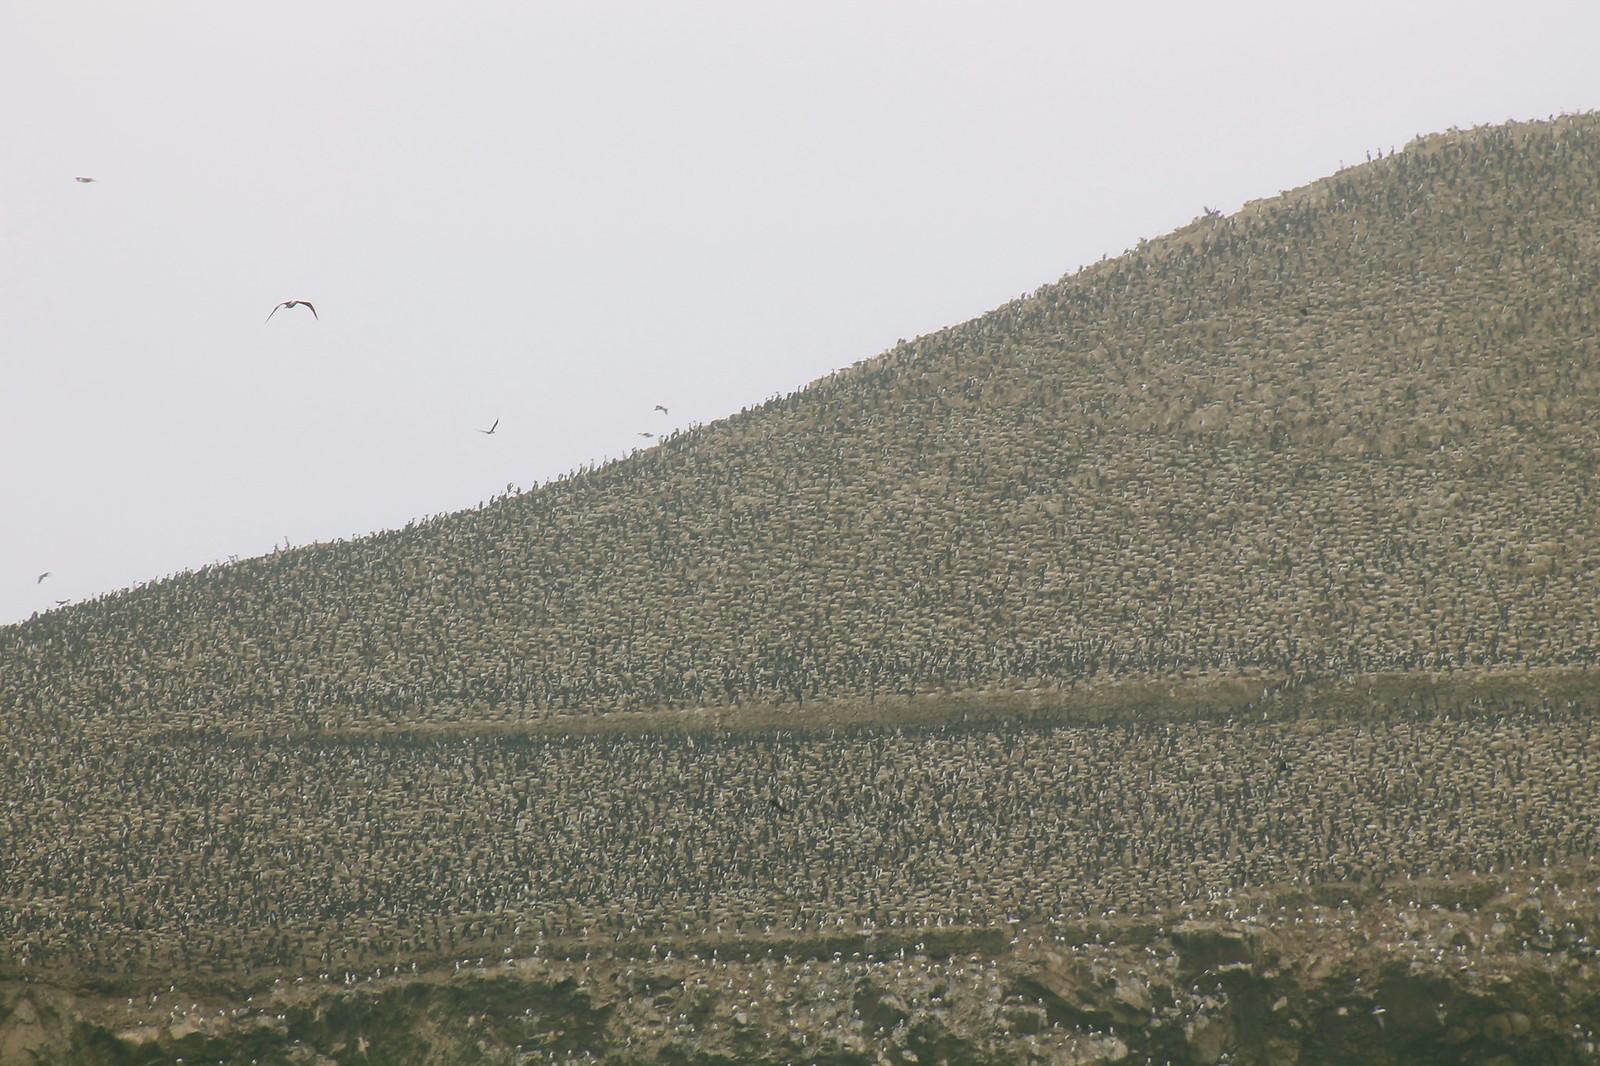 PinguinsMountain